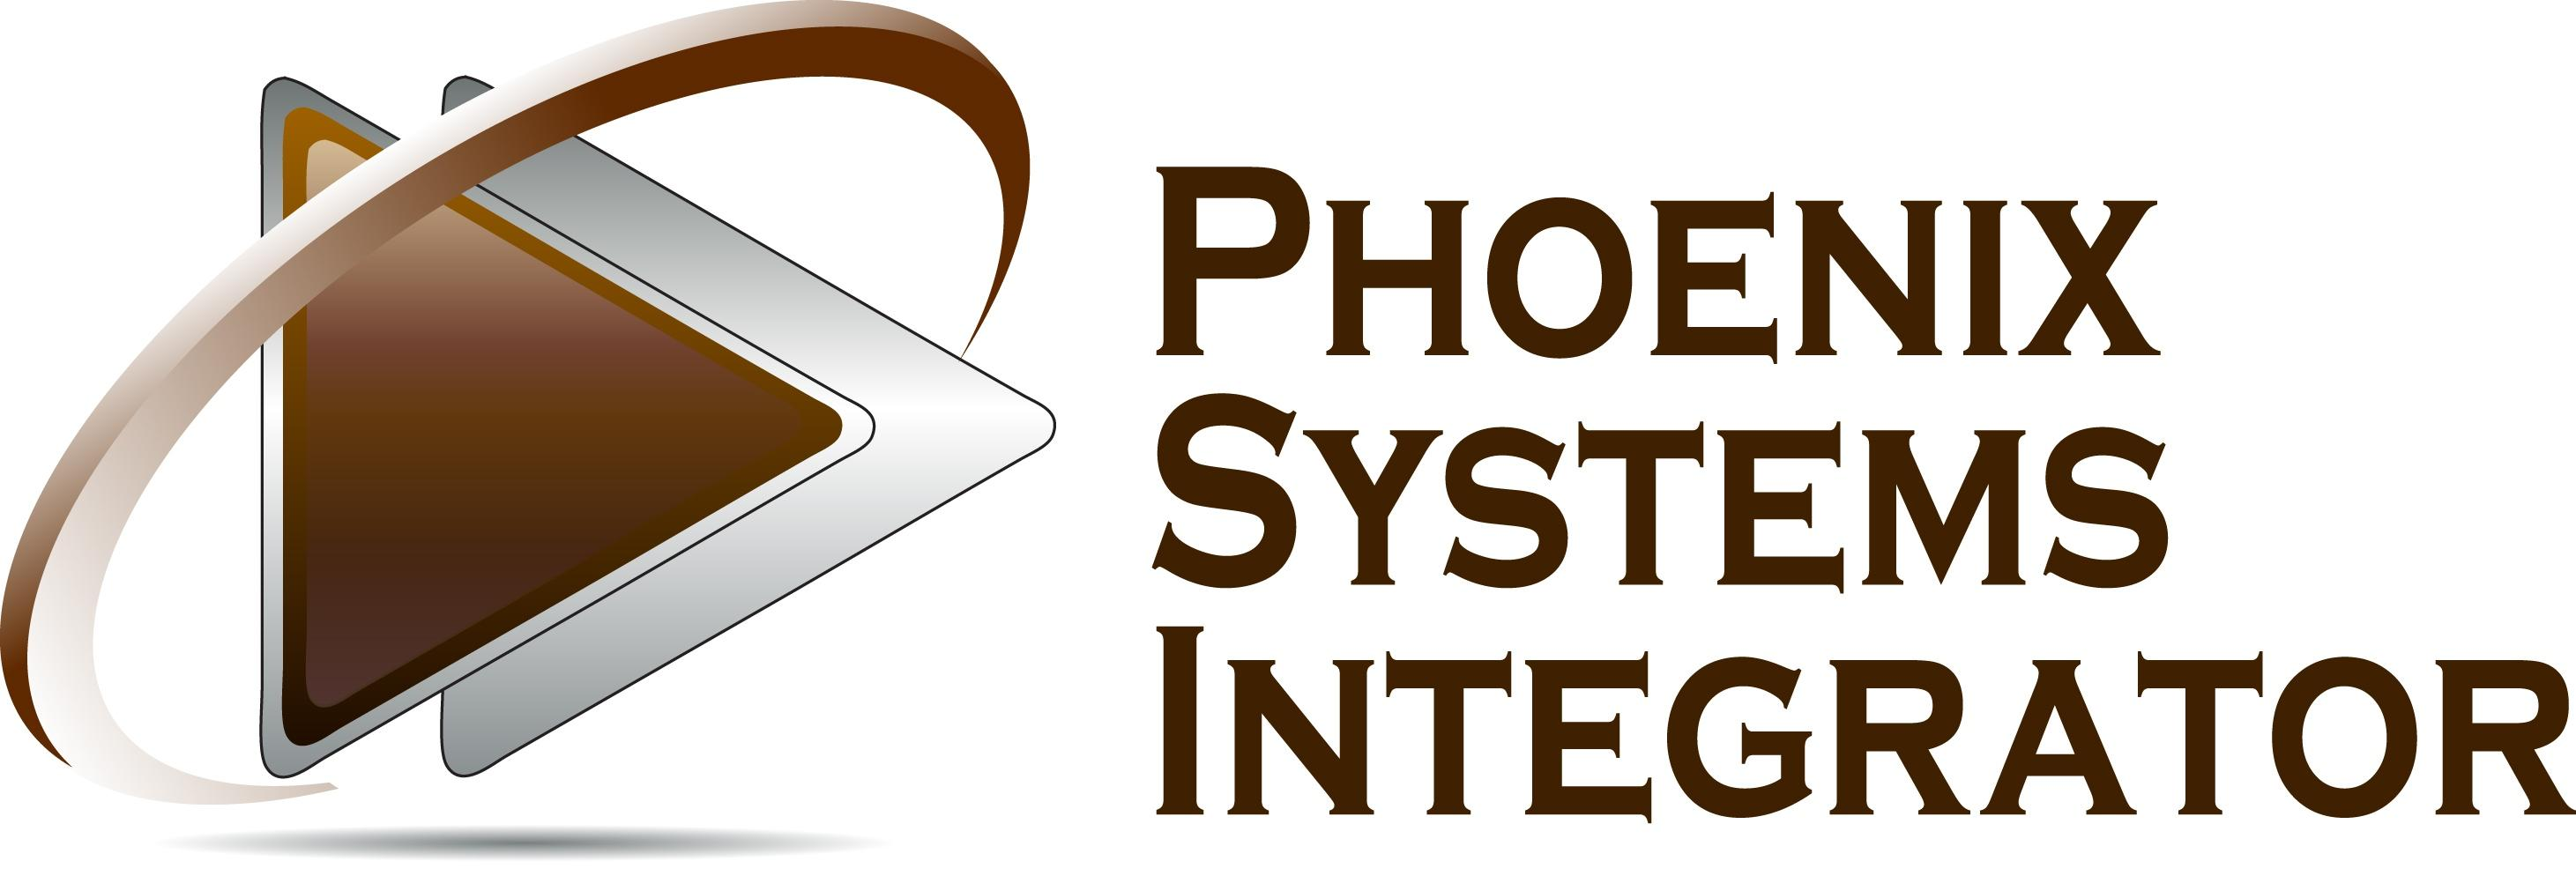 Phoenix Systems Integrator Inc. Logo